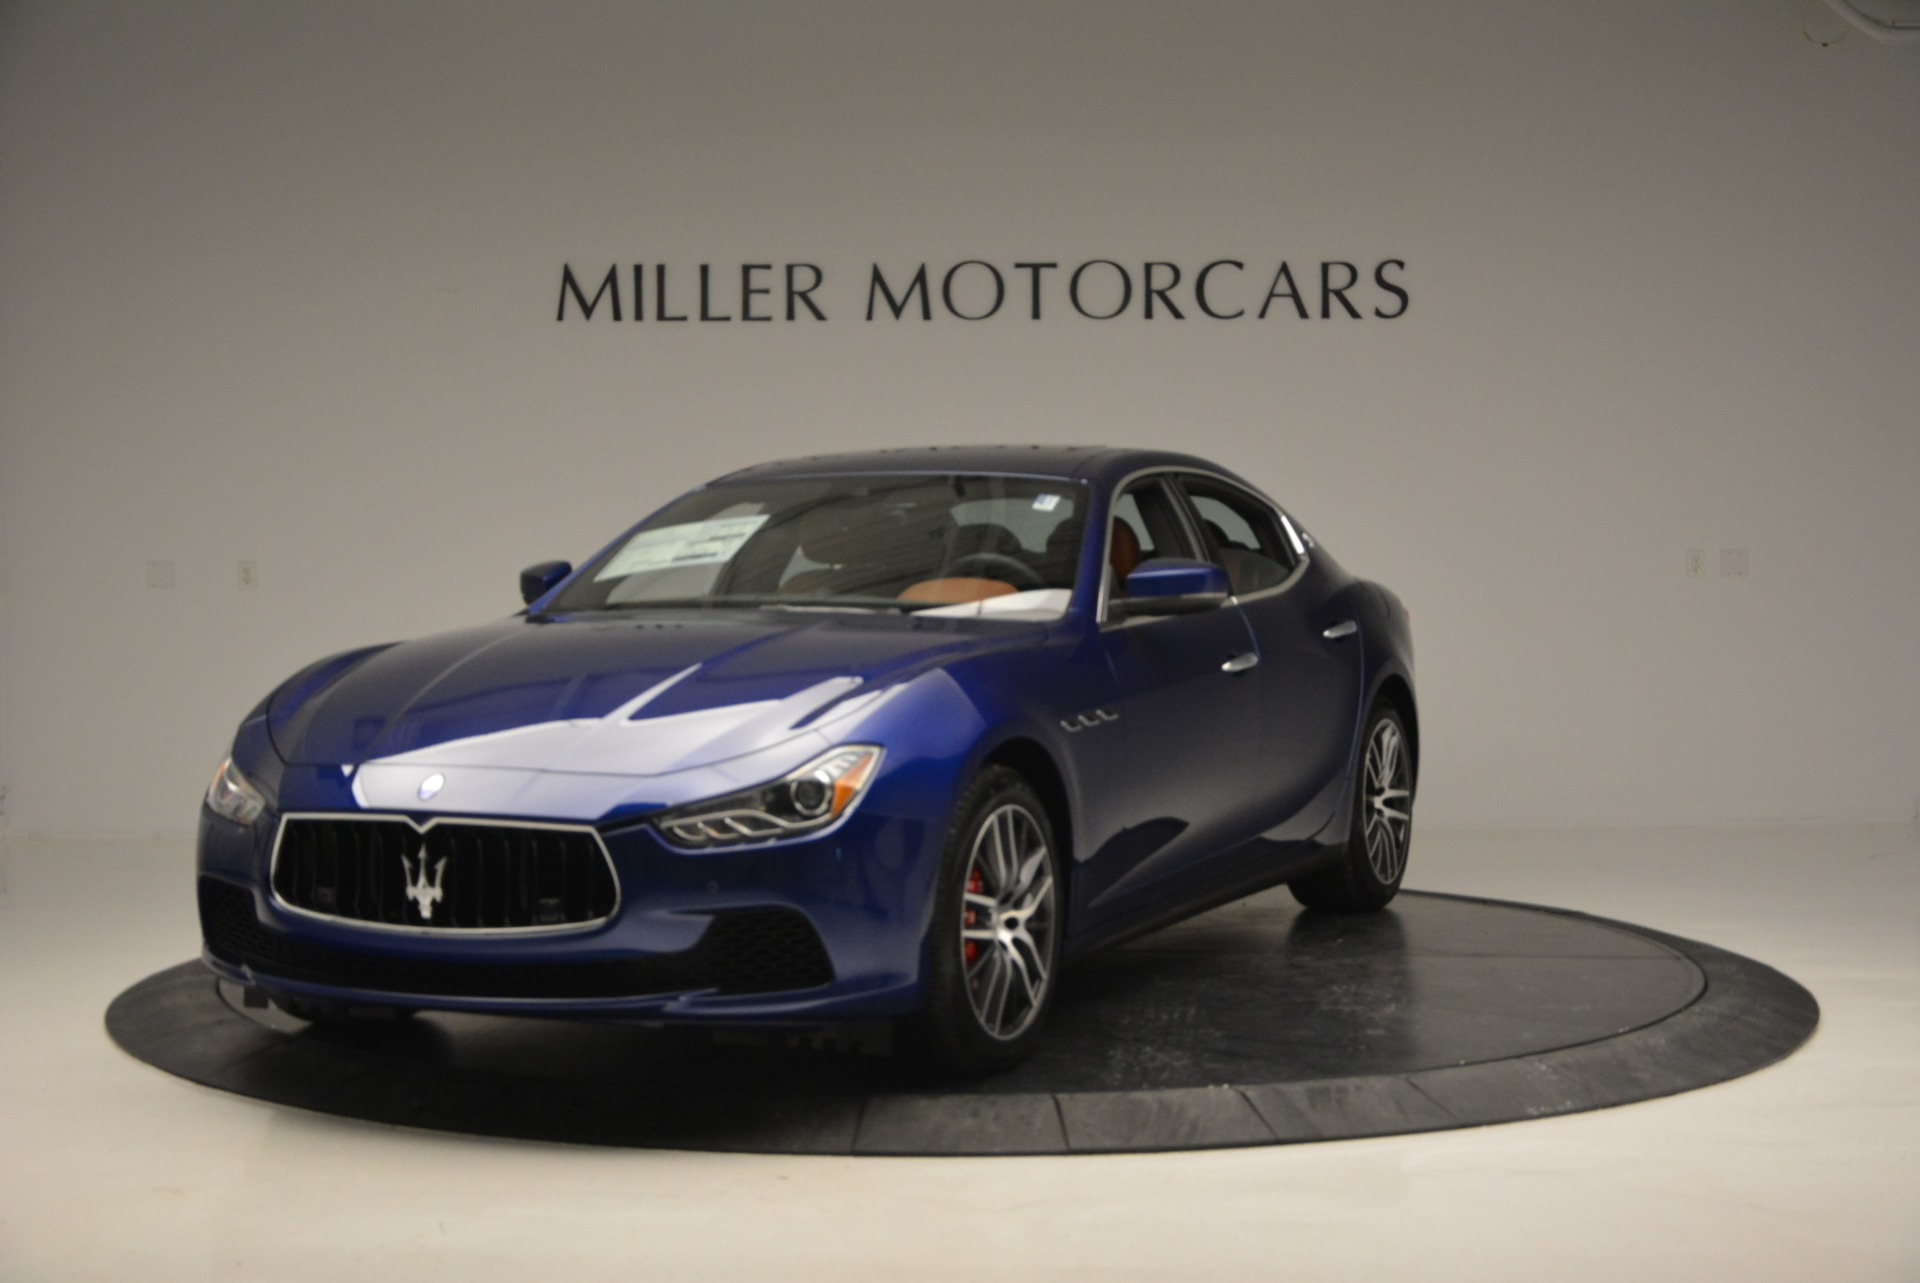 New 2017 Maserati Ghibli S Q4 For Sale In Westport, CT 767_main